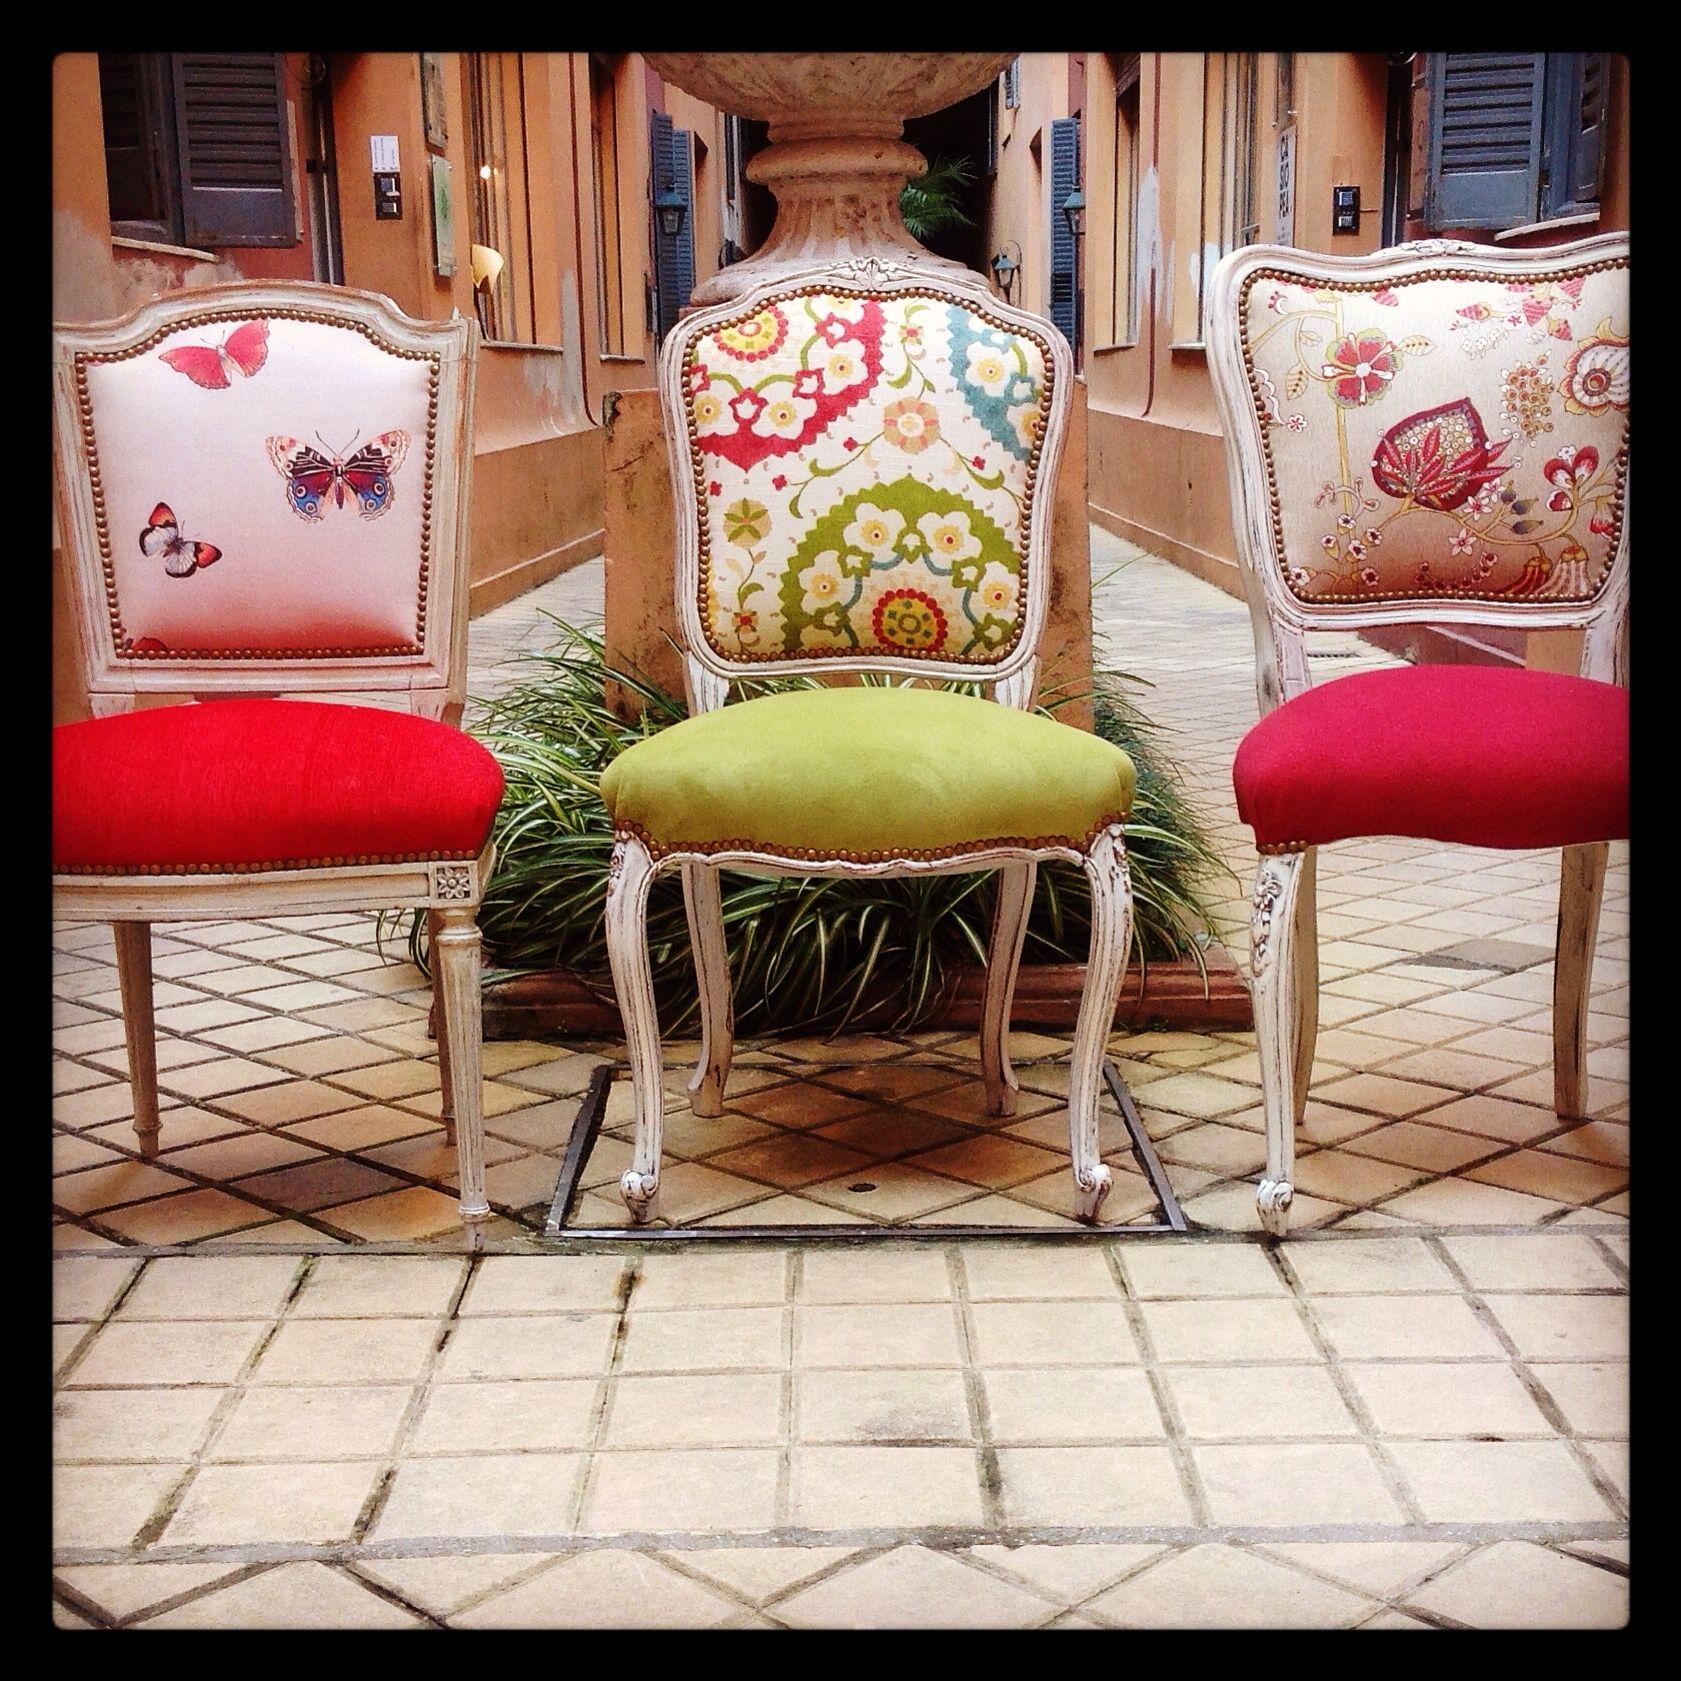 Sillas francesas antiguas comedor pinterest sillas for Sillas comedor antiguas